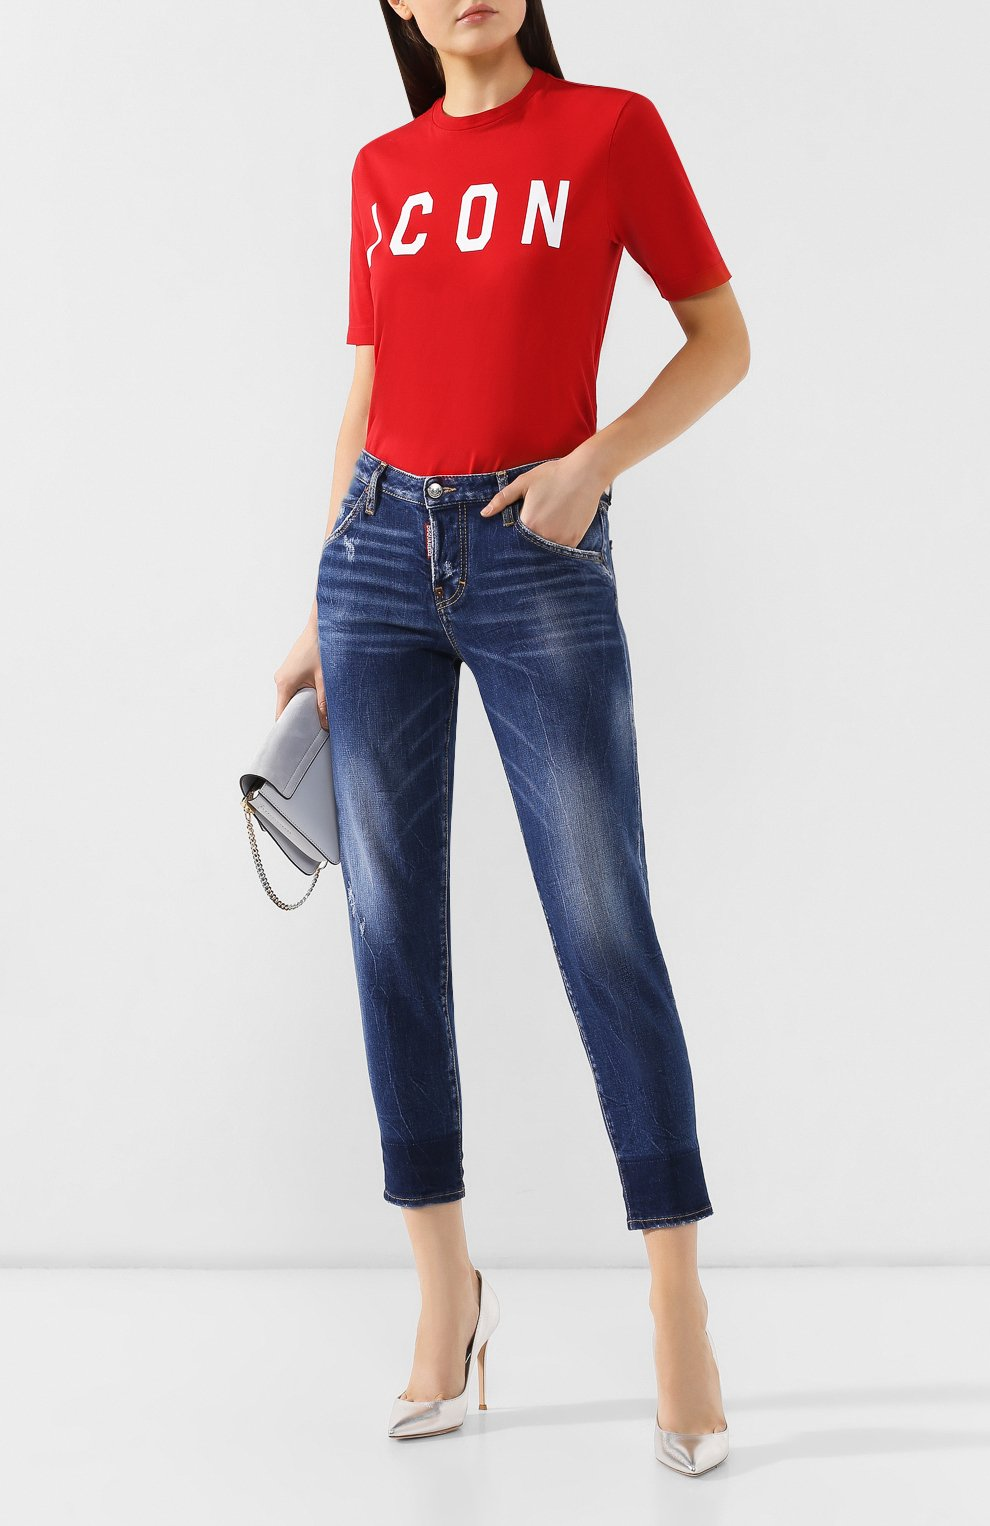 Женские джинсы DSQUARED2 синего цвета, арт. S72LB0214/S30663 | Фото 2